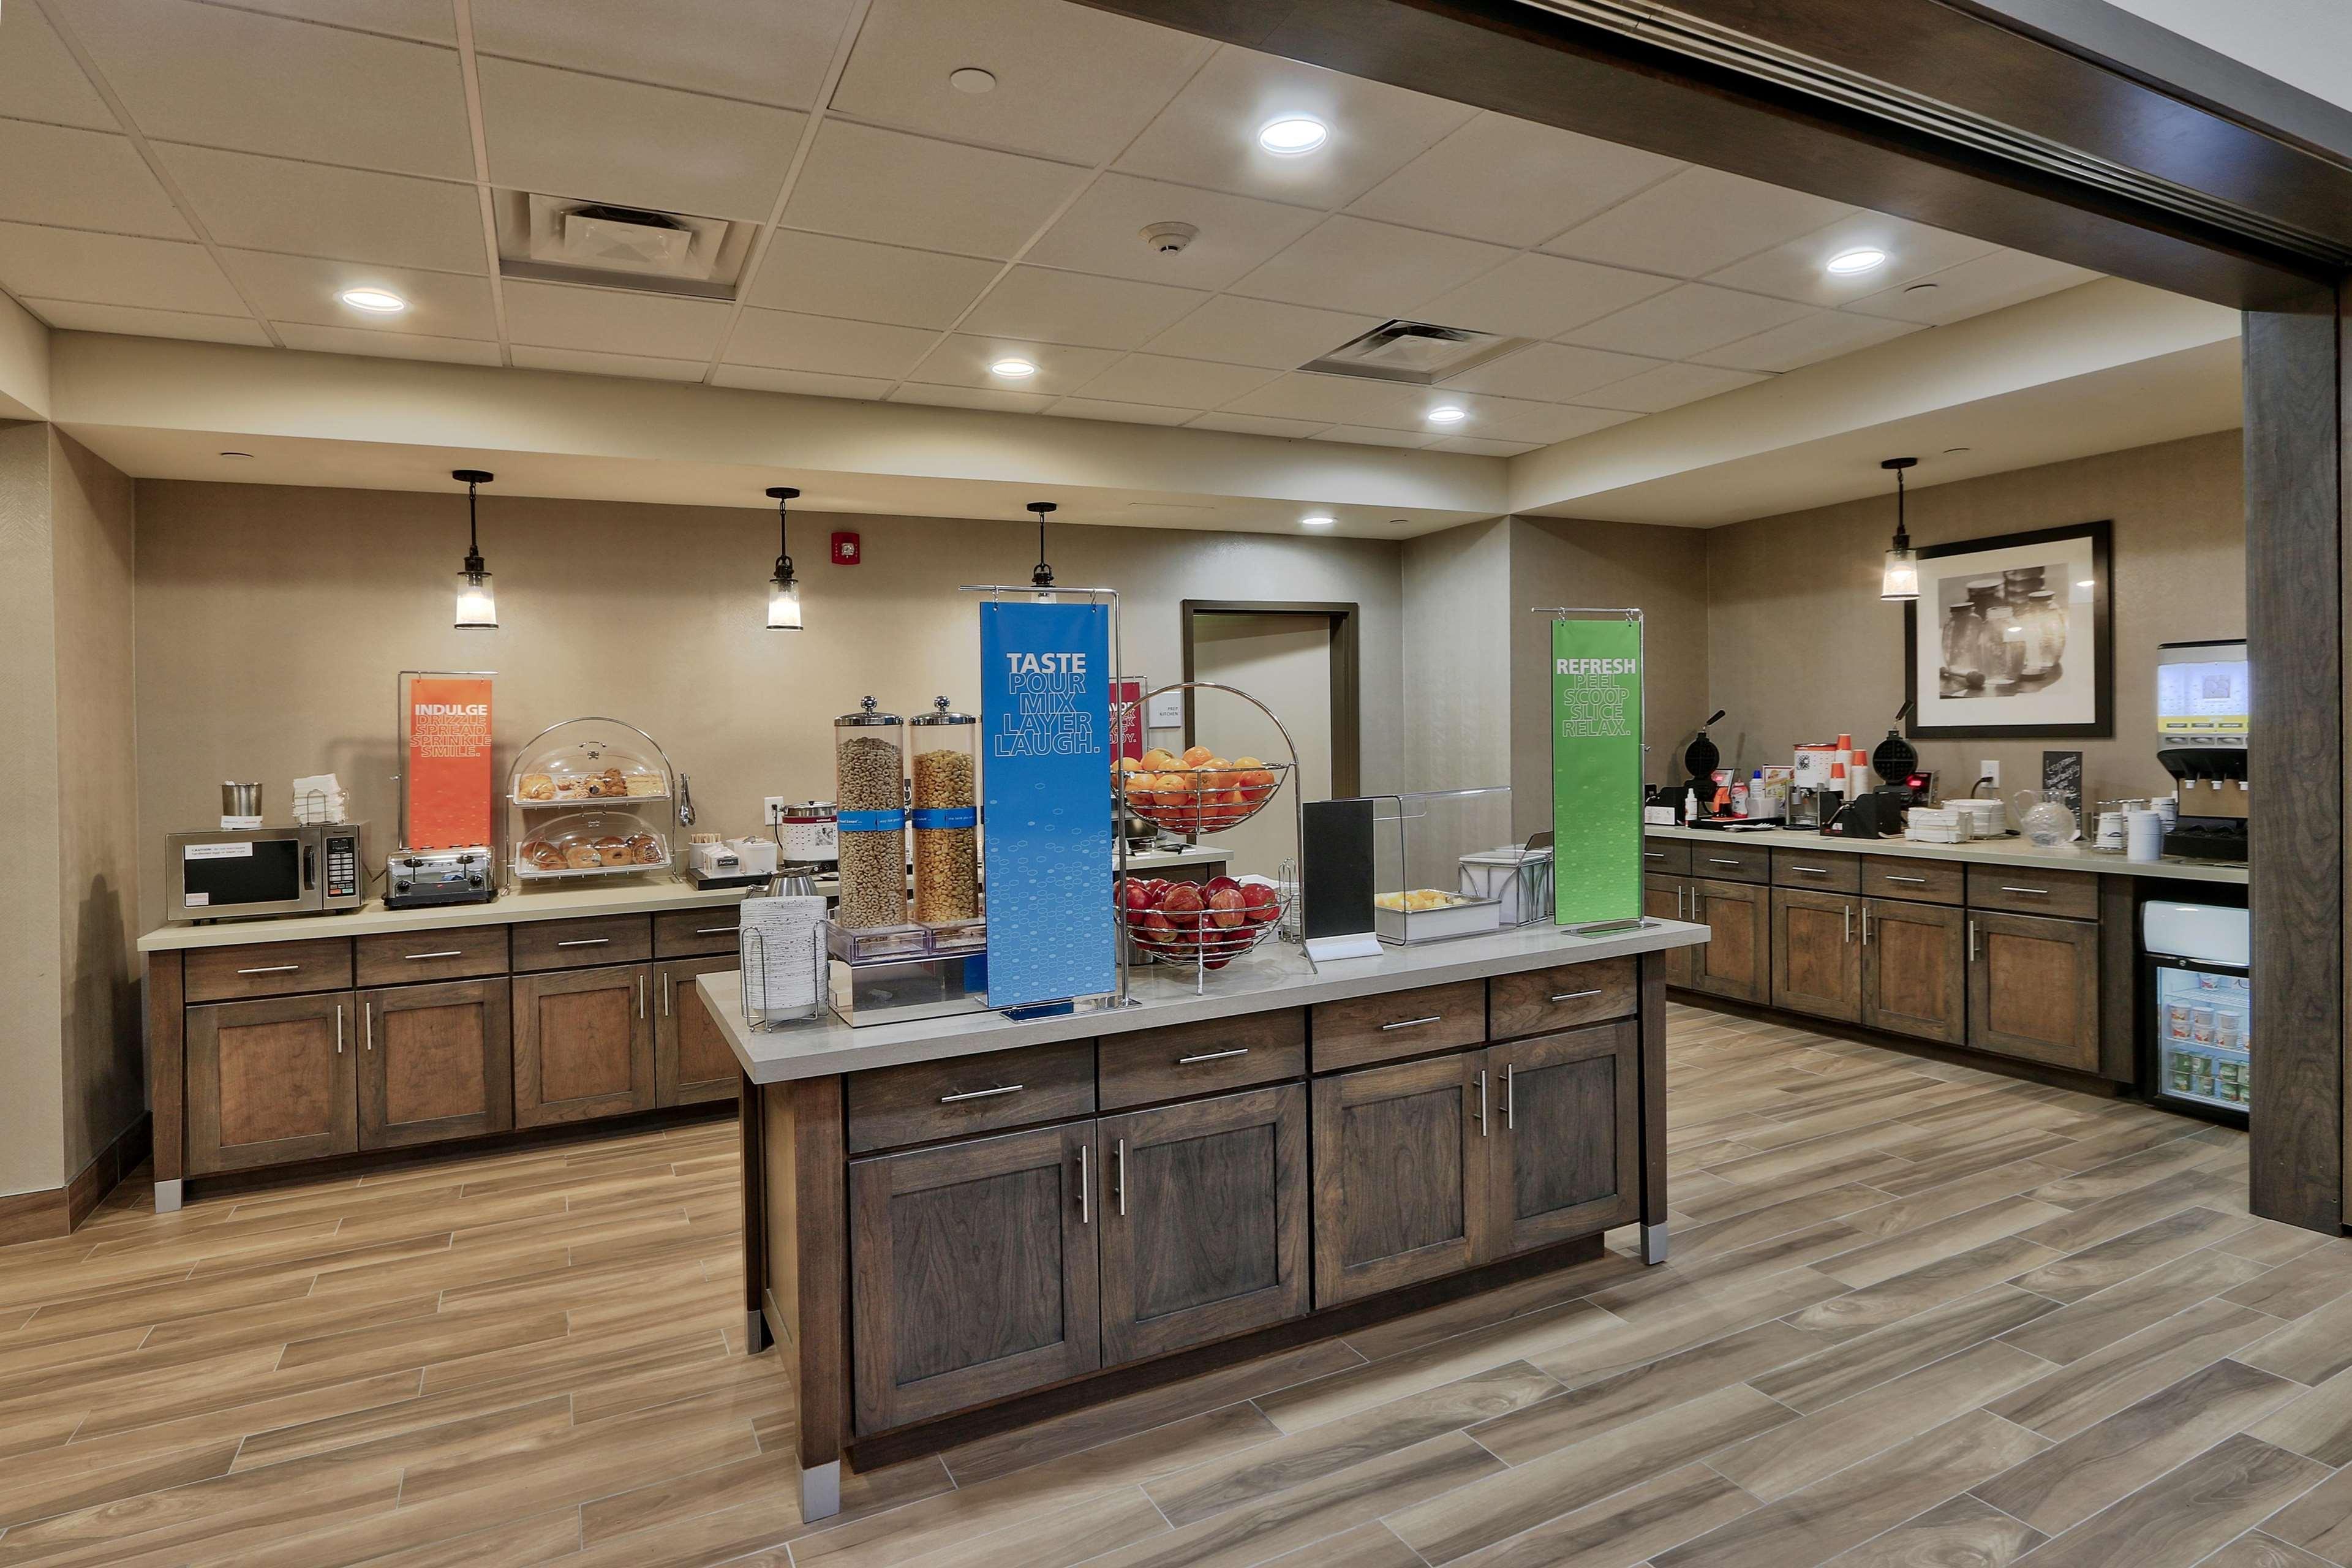 Hampton Inn & Suites Artesia image 8